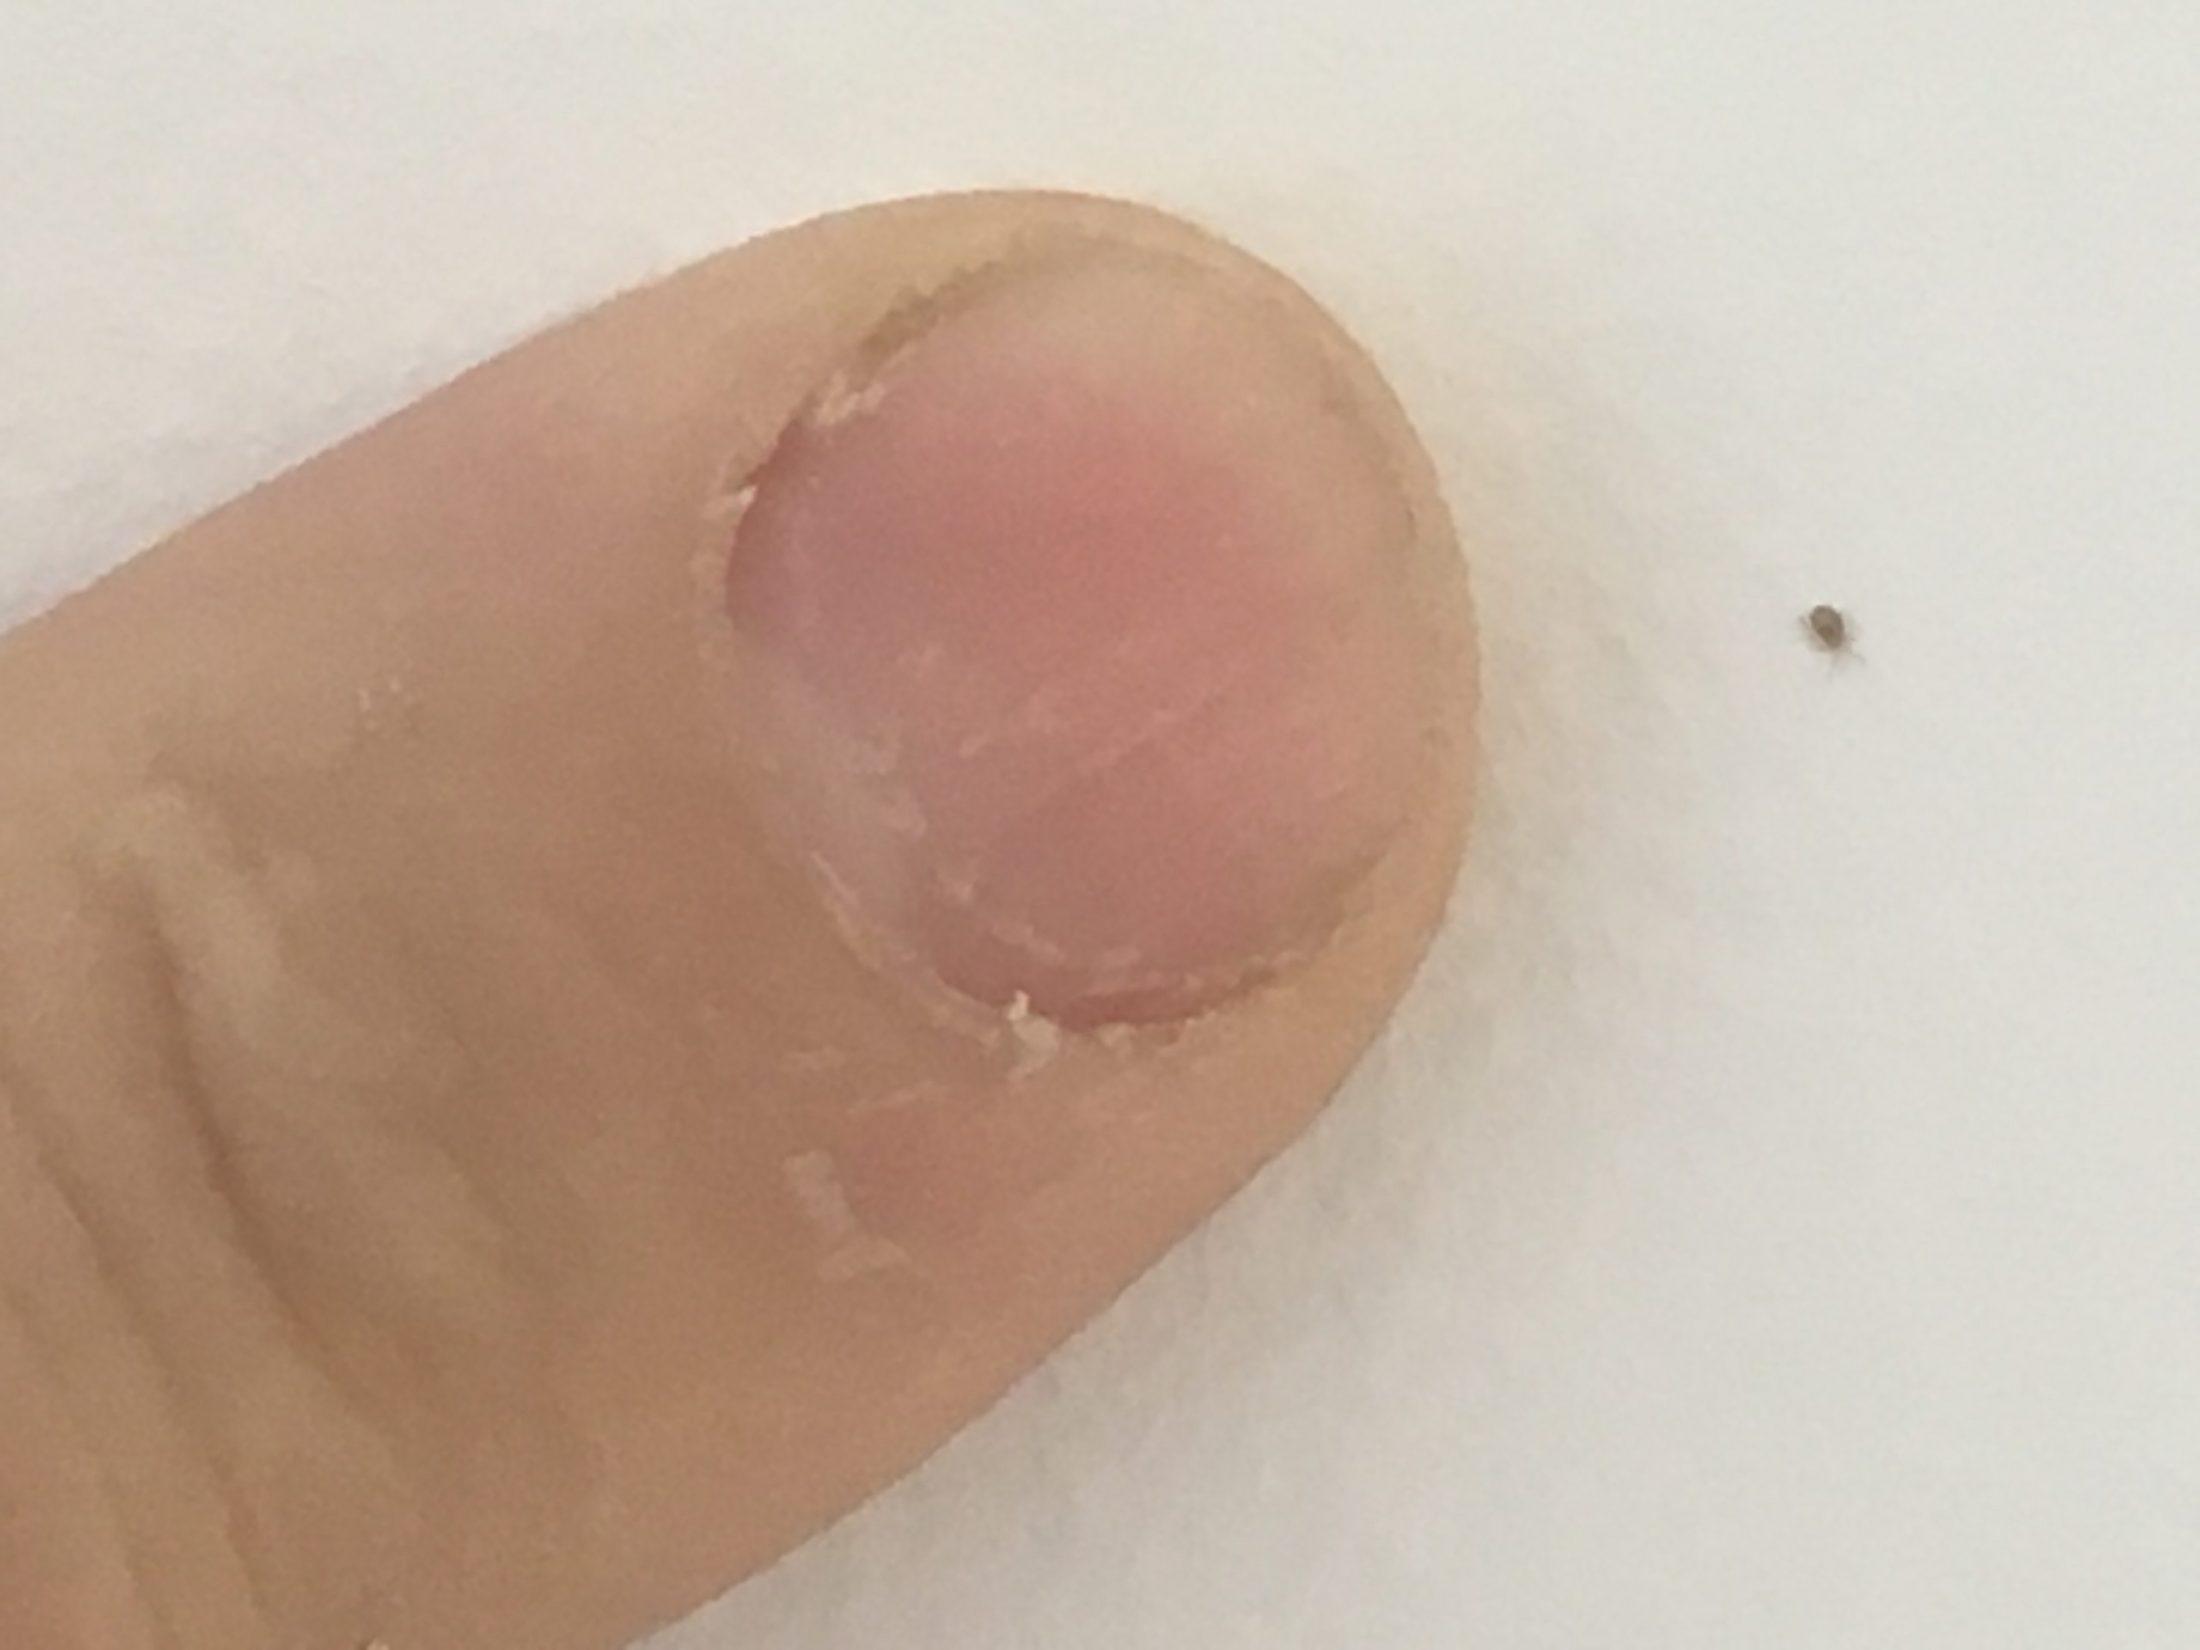 Bird Mite actual size in comparison to a small finger nail.